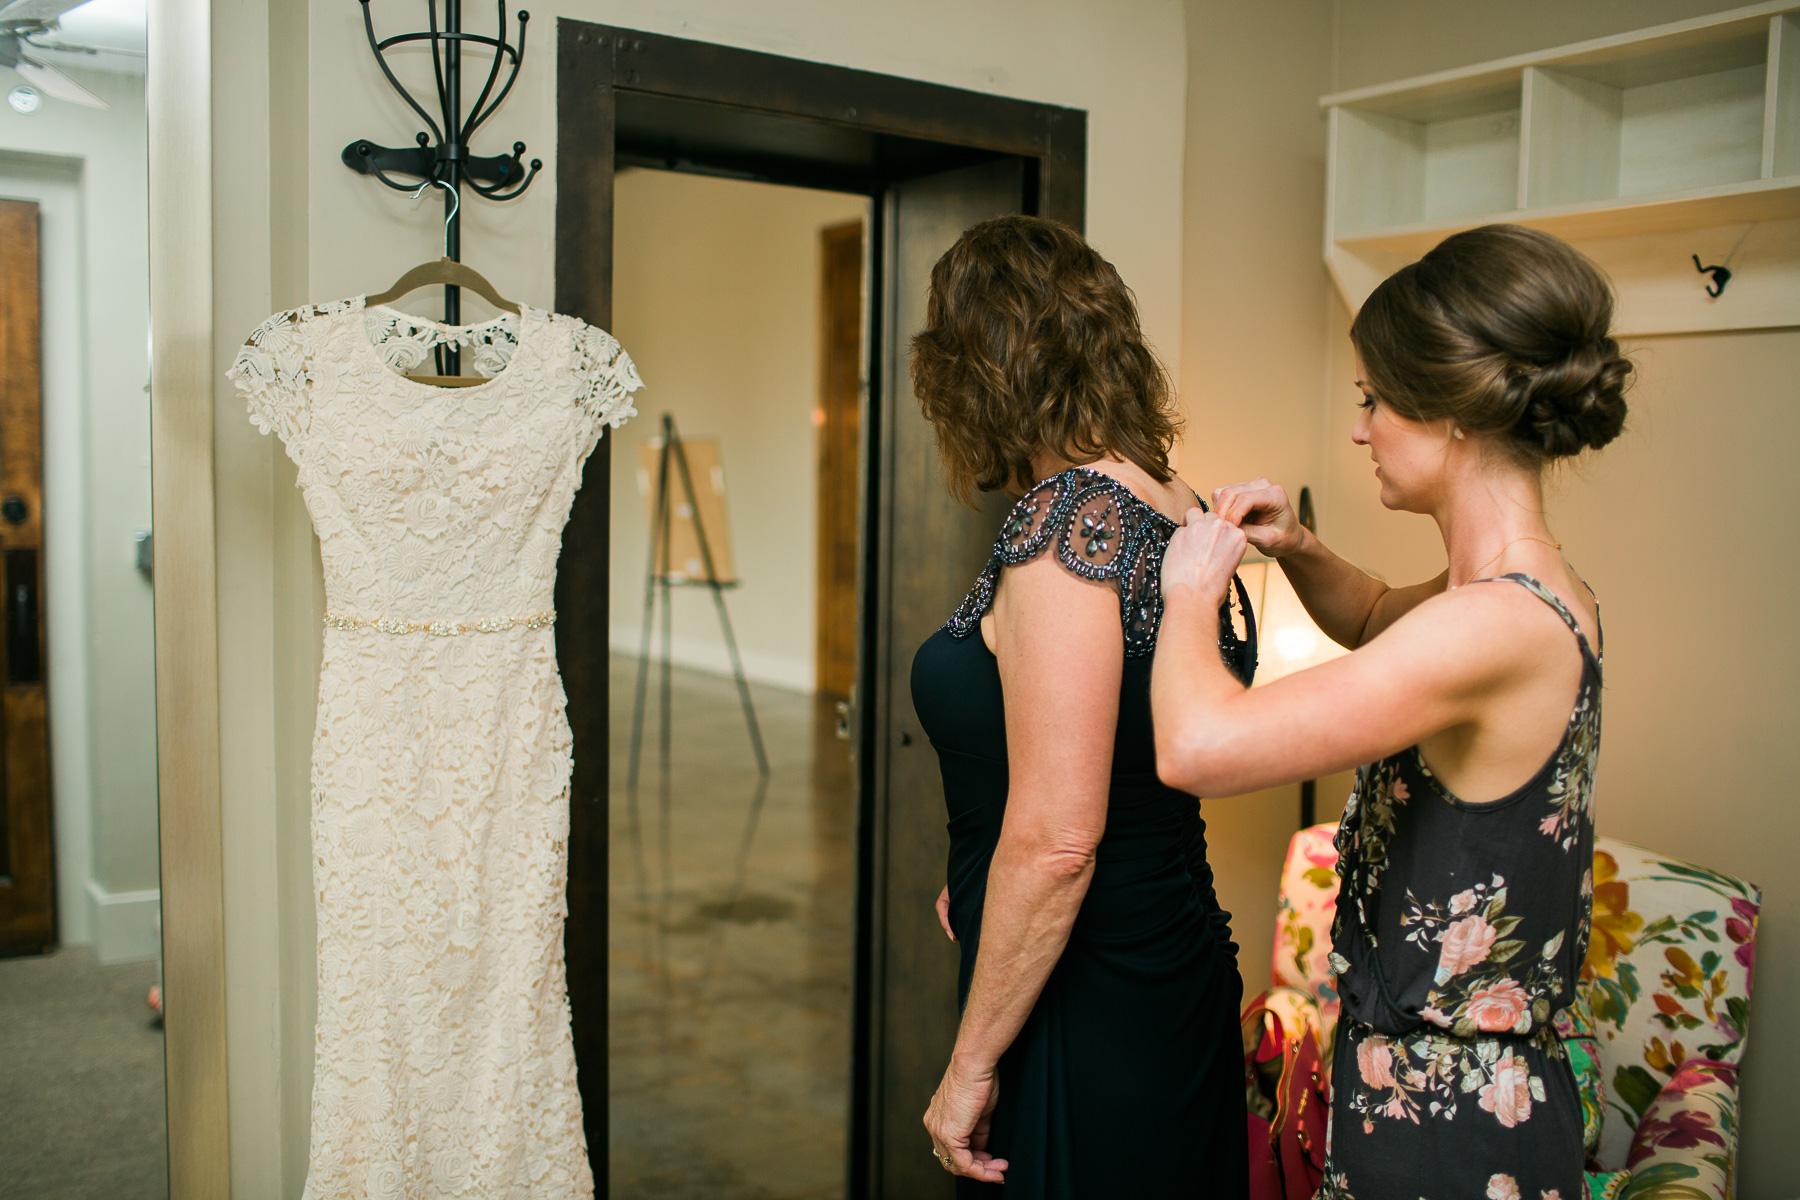 Bride pinning mom's dress